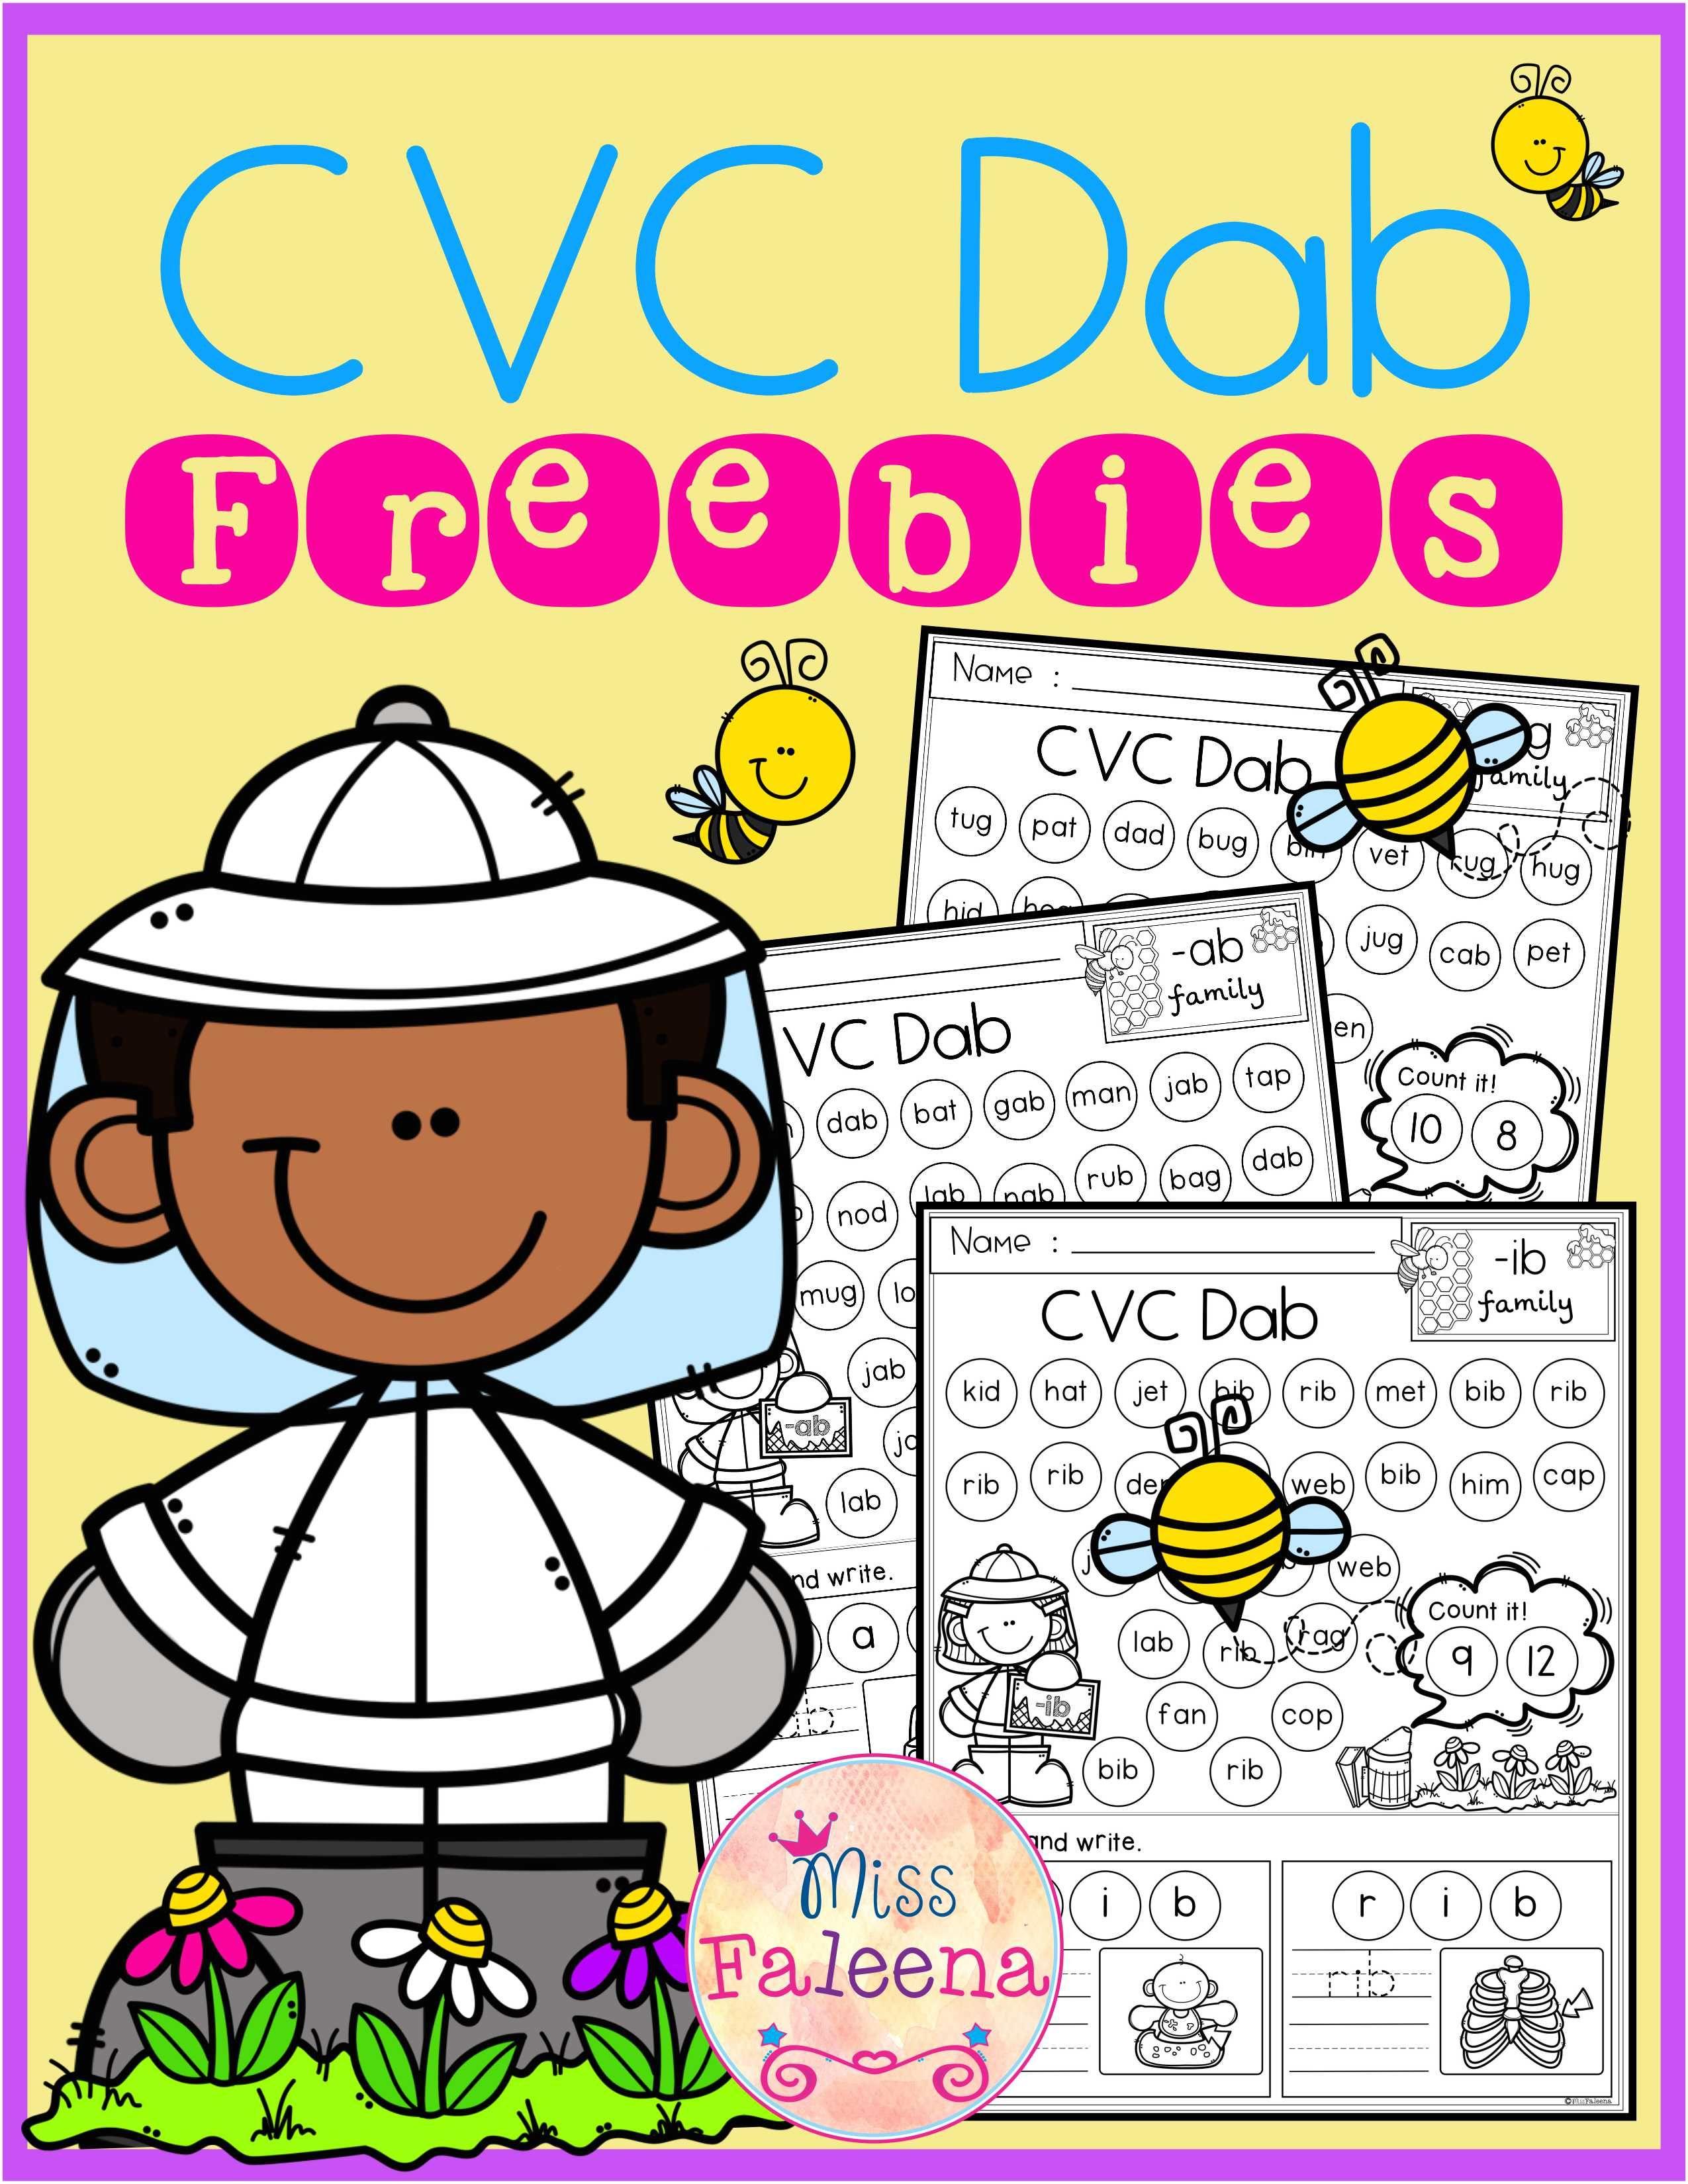 Free Cvc Dab